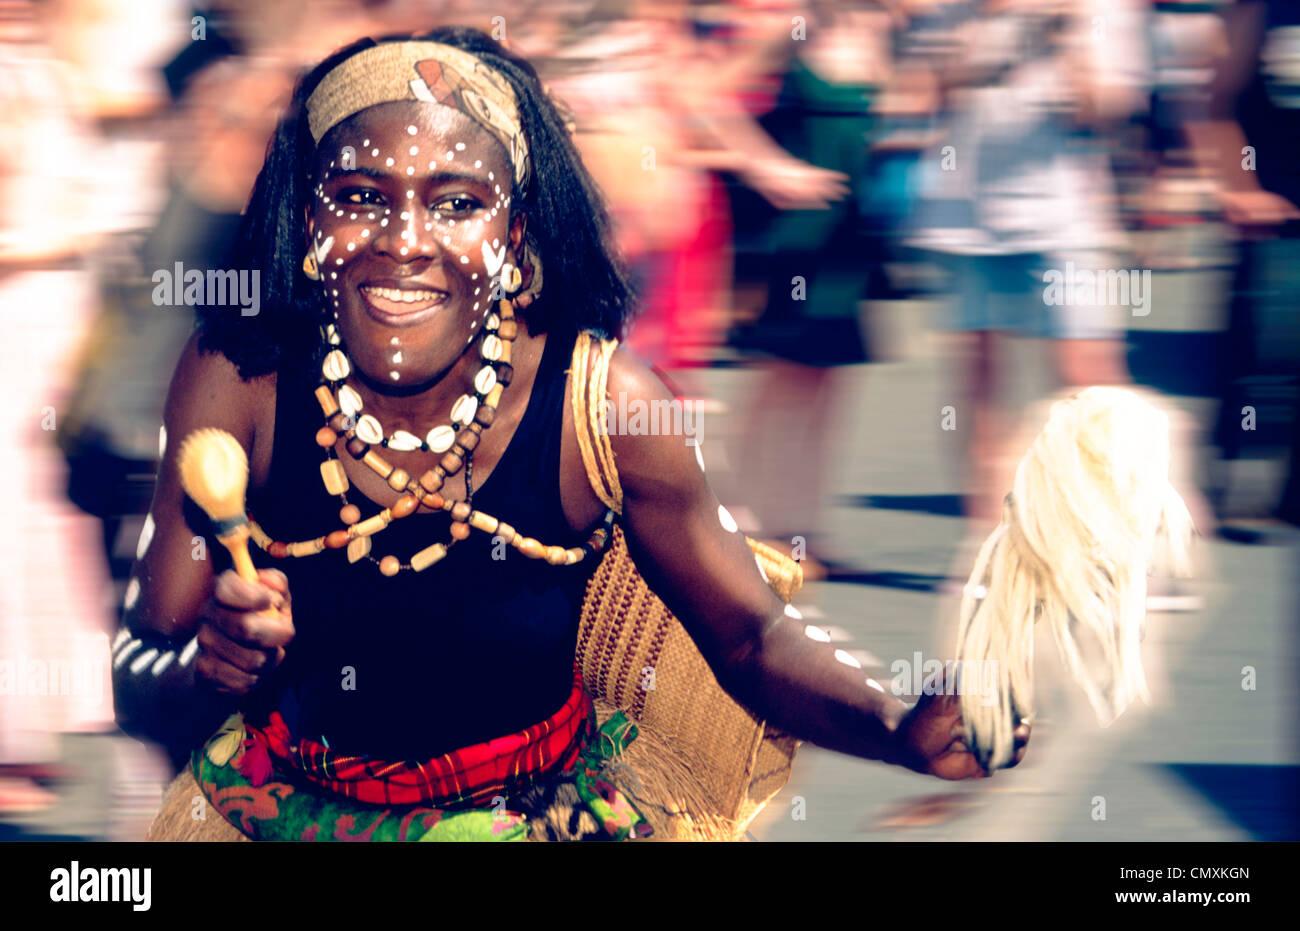 Carnaval des Cultures, Berlin Photo Stock